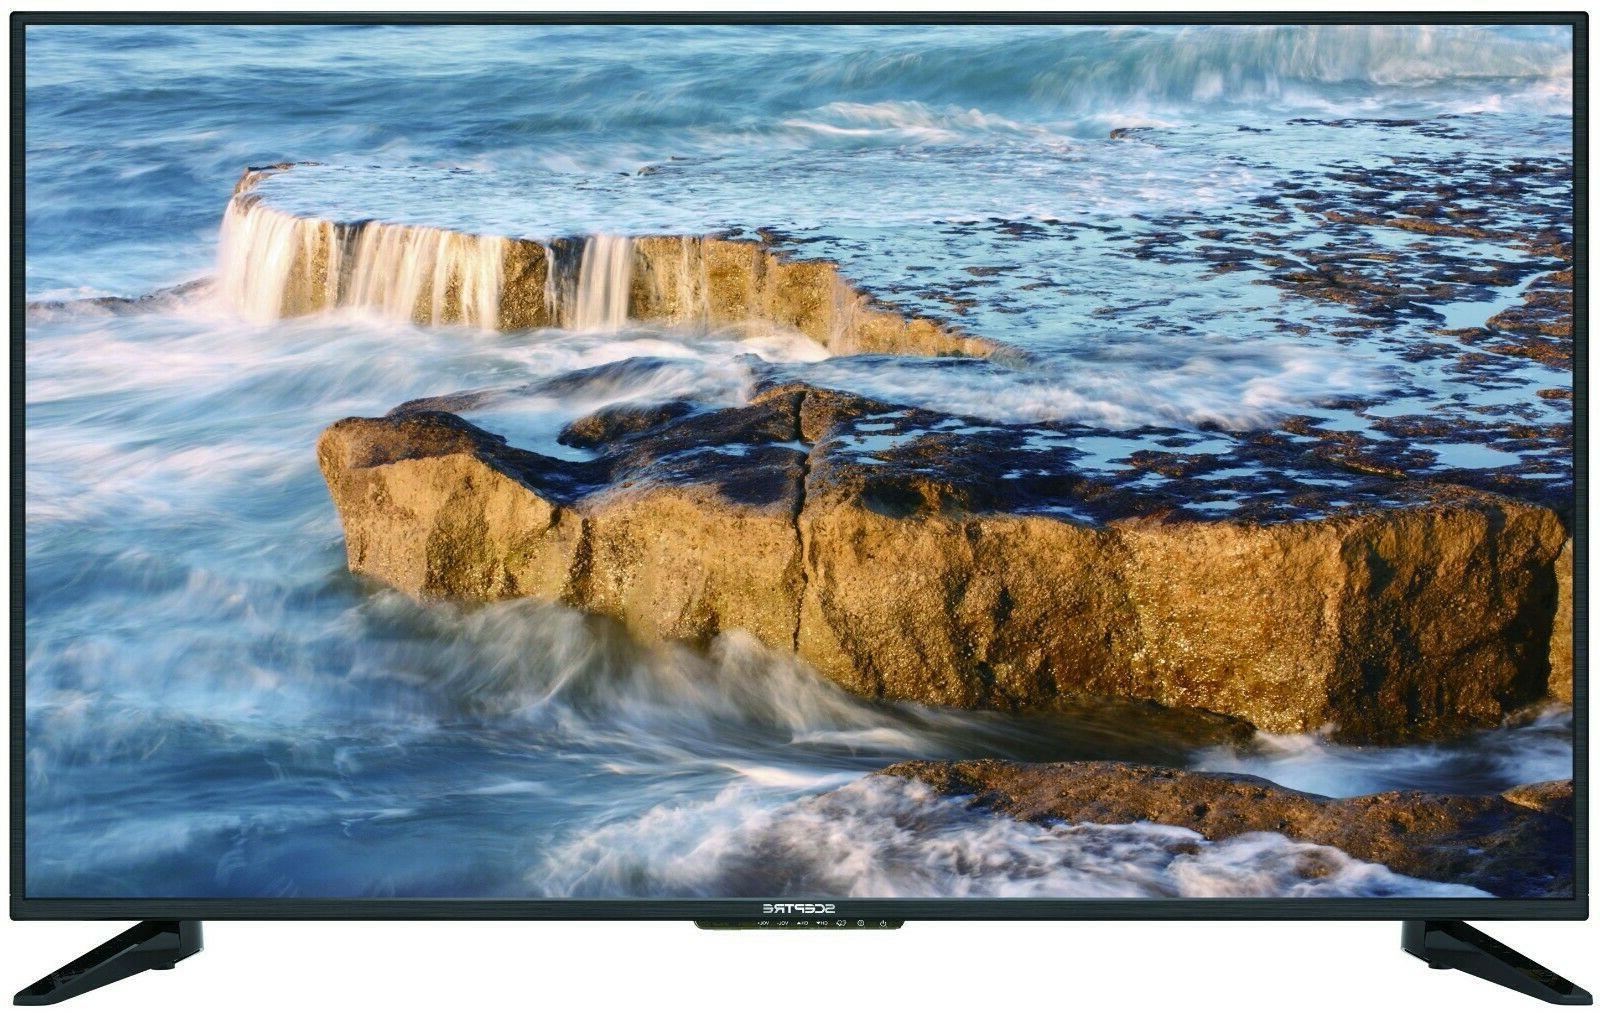 Brand Sceptre Class UHD LED TV